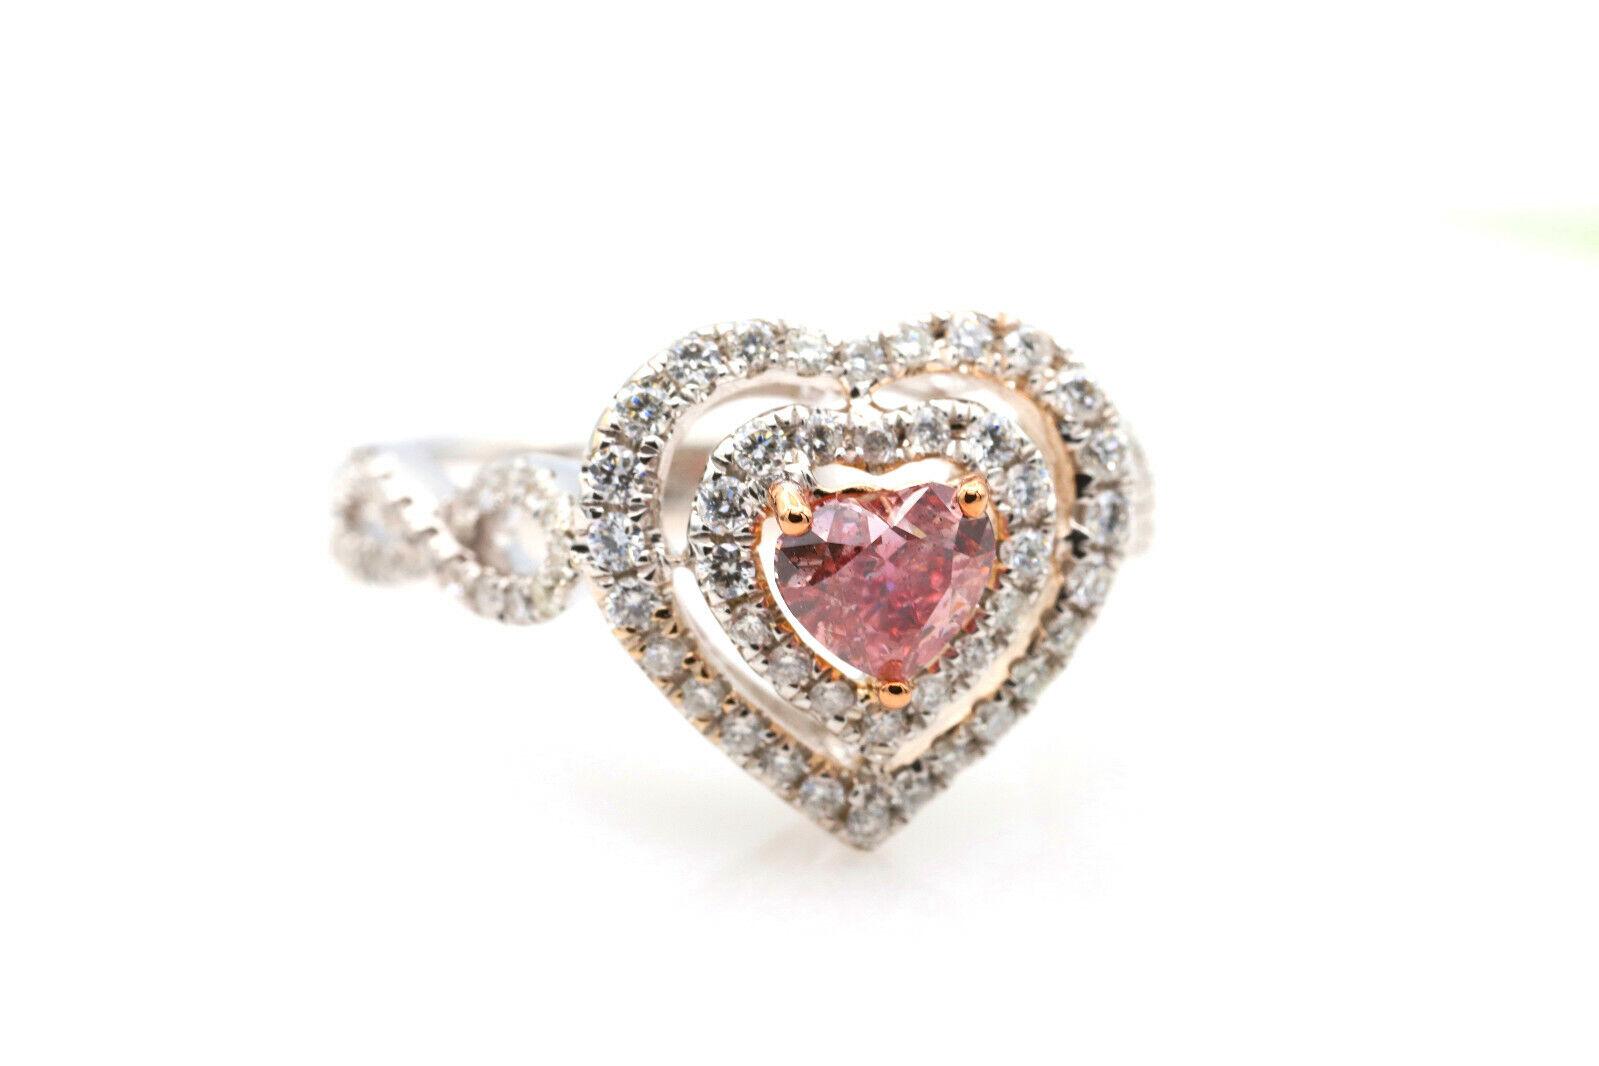 Argyle 1.07ct Natural Fancy Deep Pink Diamond Engagement Ring GIA 18K White Gold 3